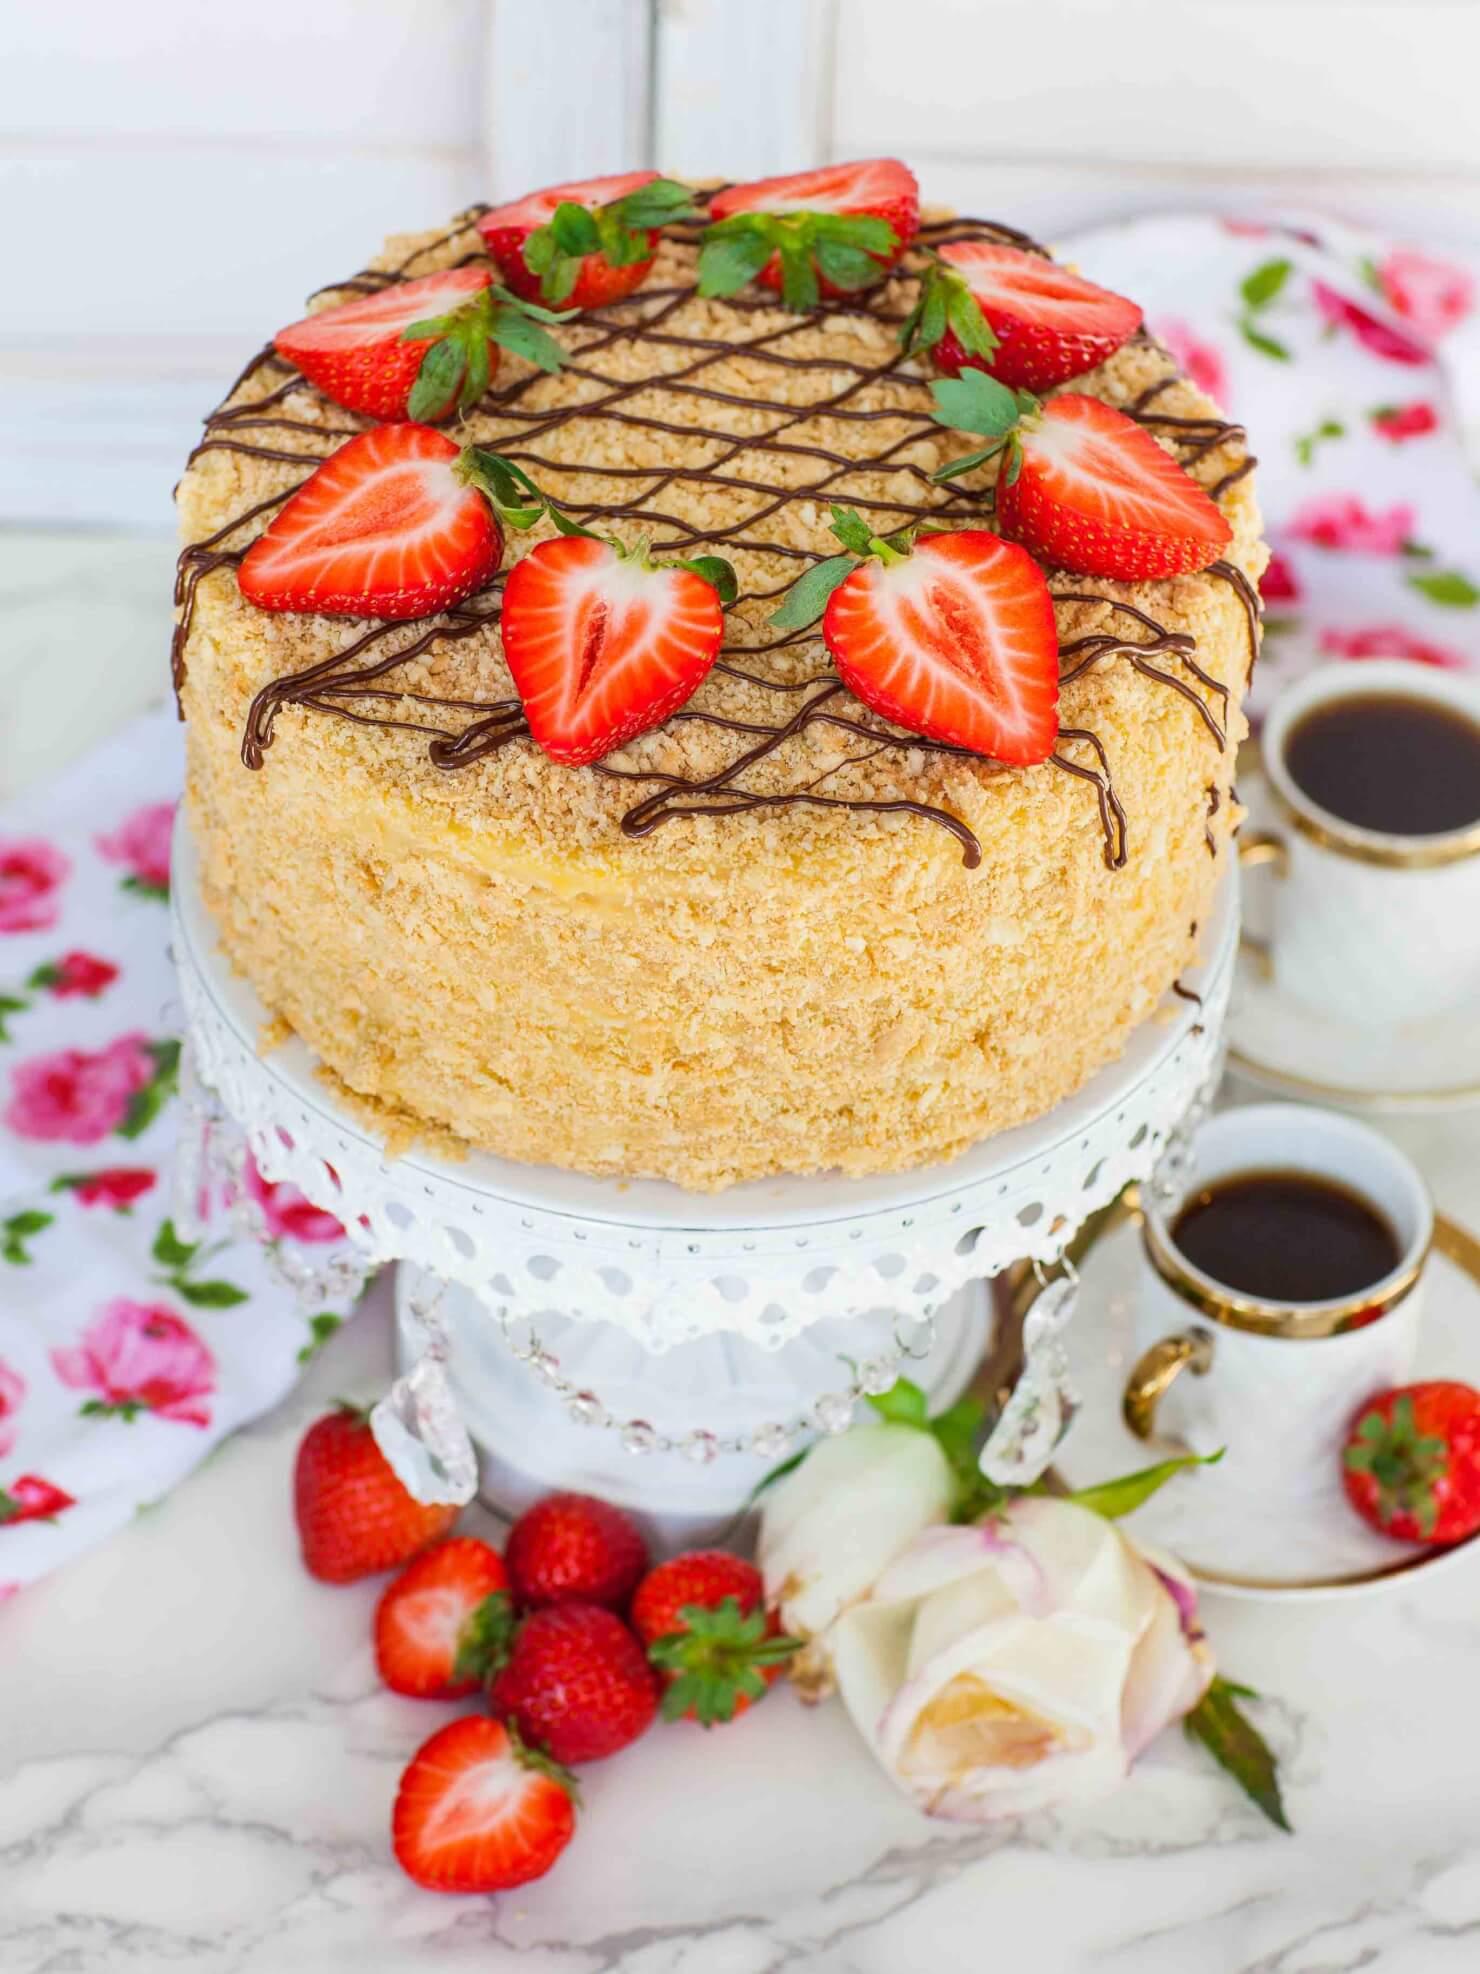 Torte Napoleon  Tatyanas Everyday Food